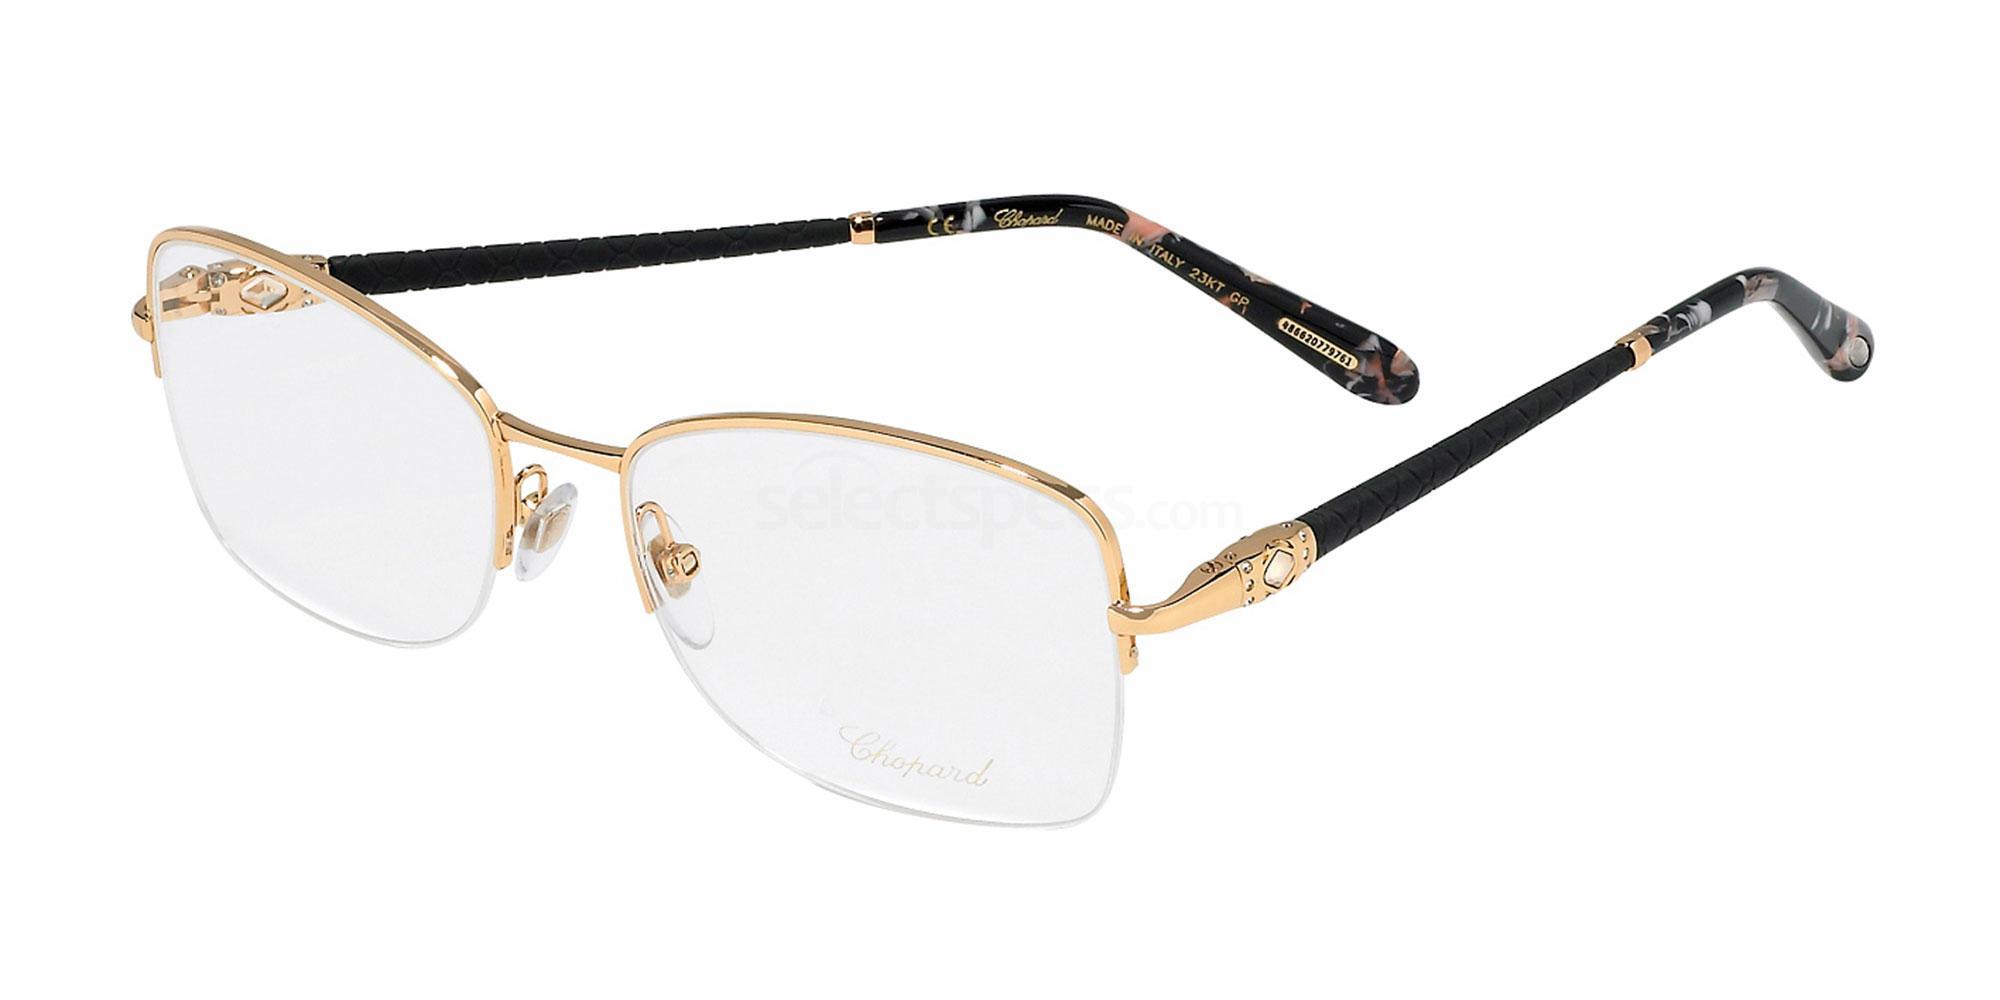 0300 VCHC72S Glasses, Chopard